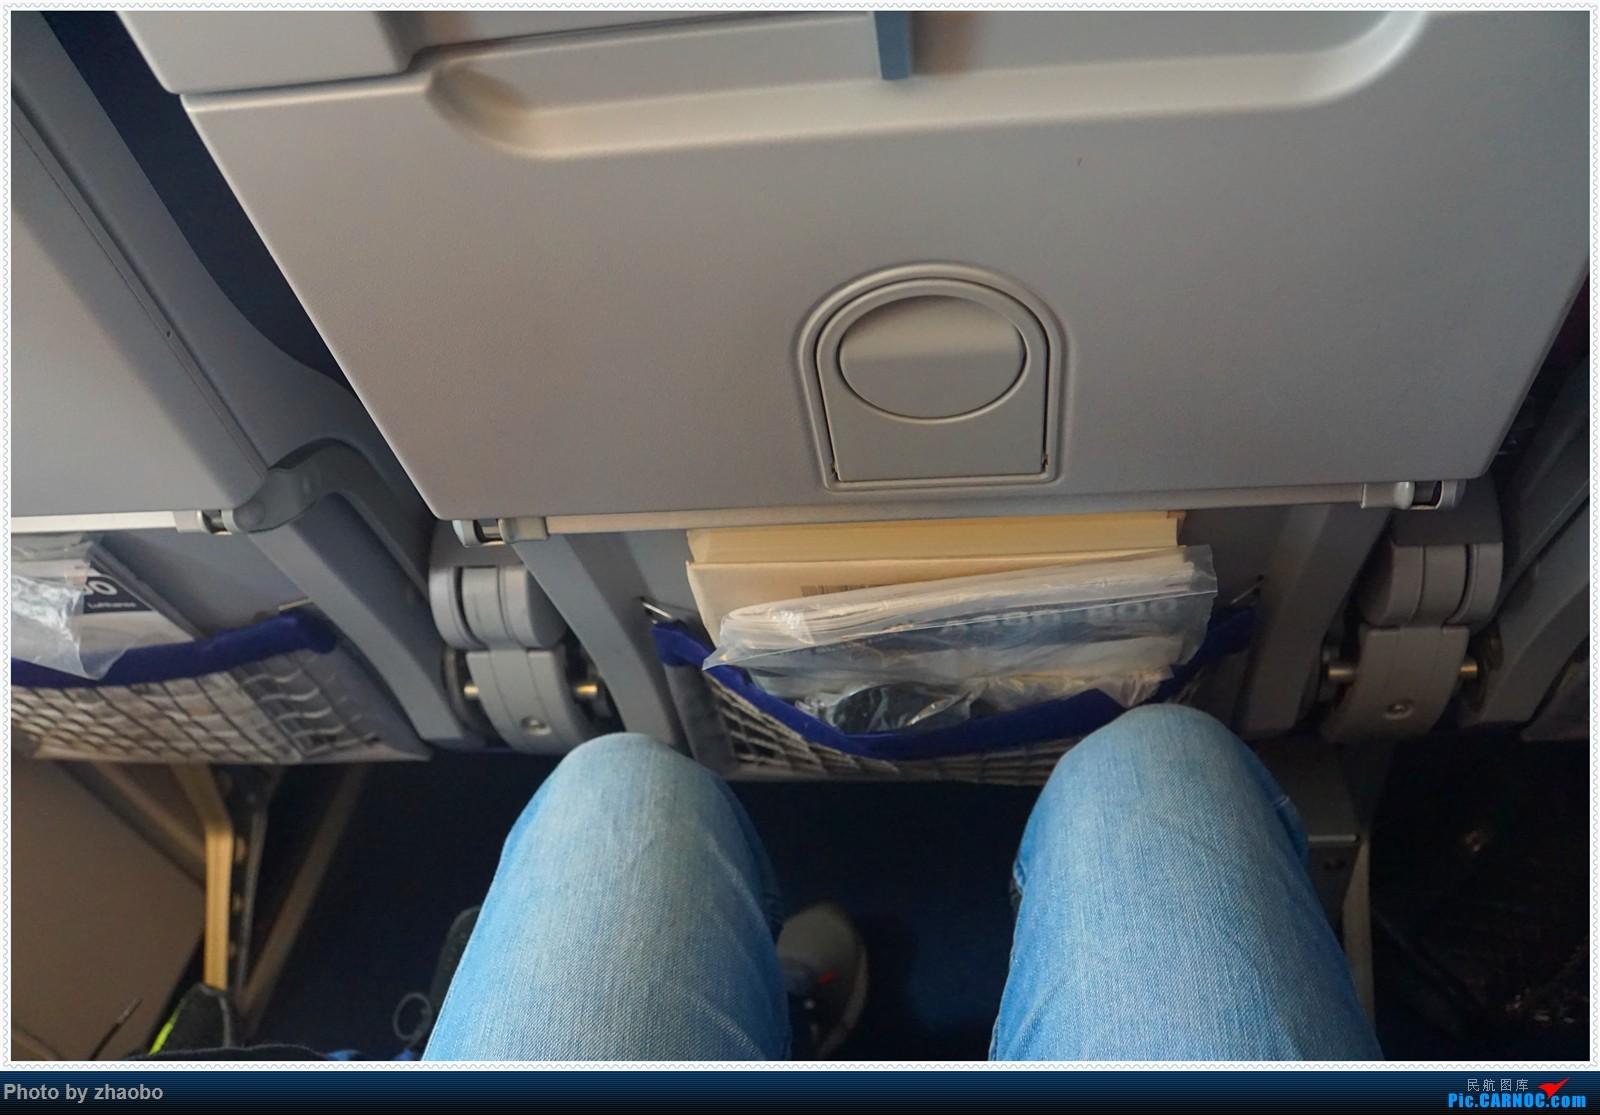 Re:[原创]从南到北游英伦-我的星空之旅,汉莎航空初体验和一点不输给欧洲列强的国航 AIRBUS A330-200